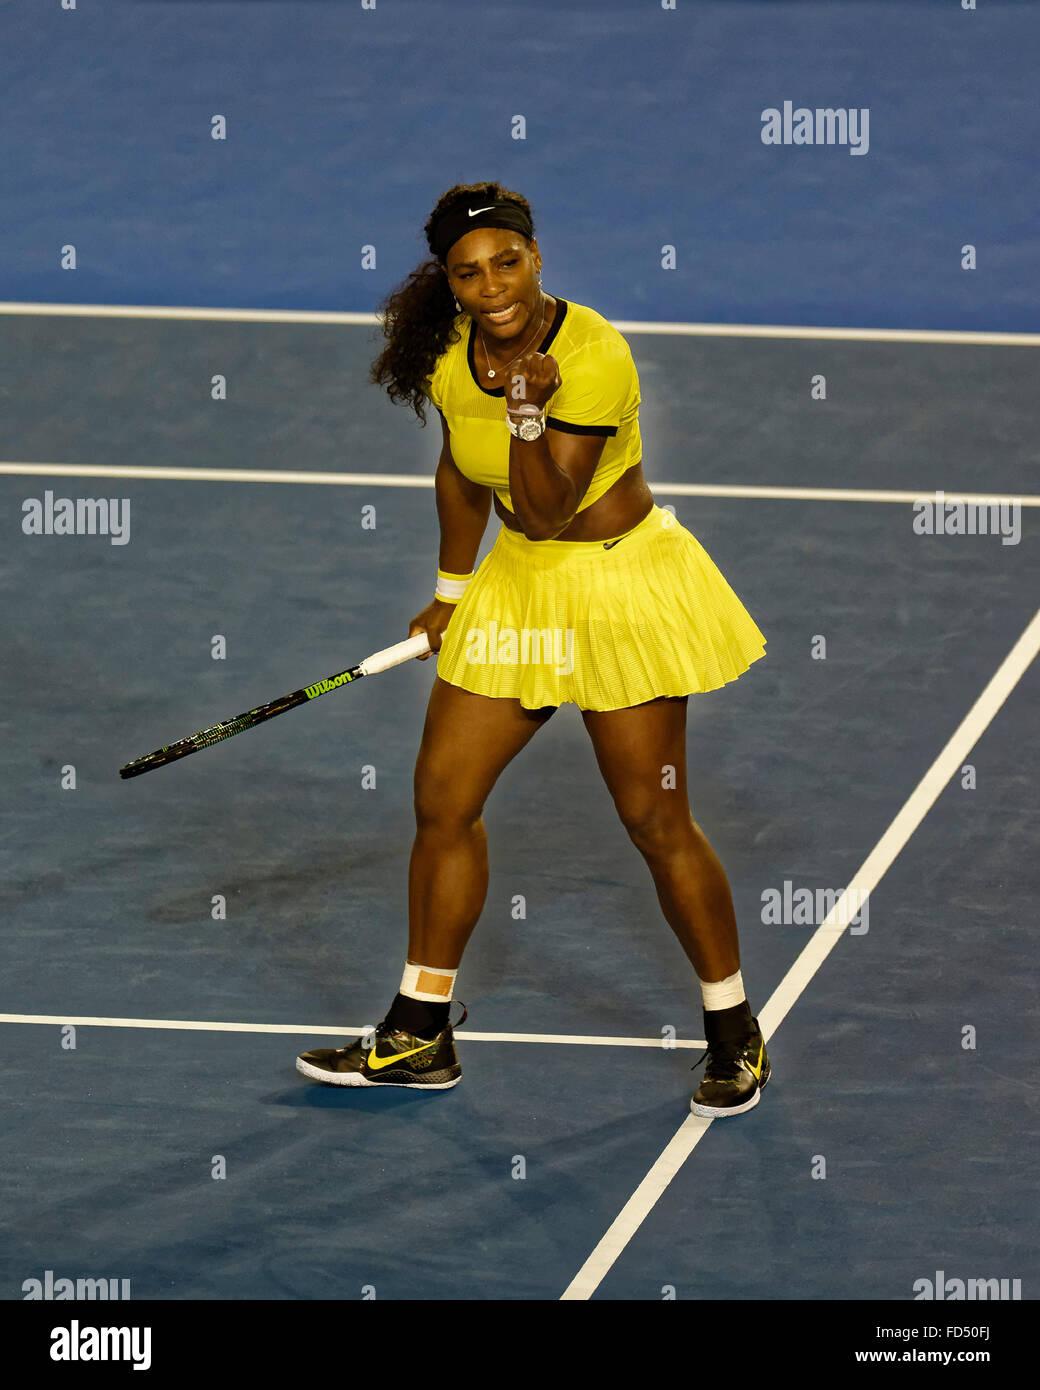 Melbourne, Australien. 28. Januar 2016. Serena Williams (USA) in Aktion gegen Agnleszka Radwanska (POL), während Stockfoto